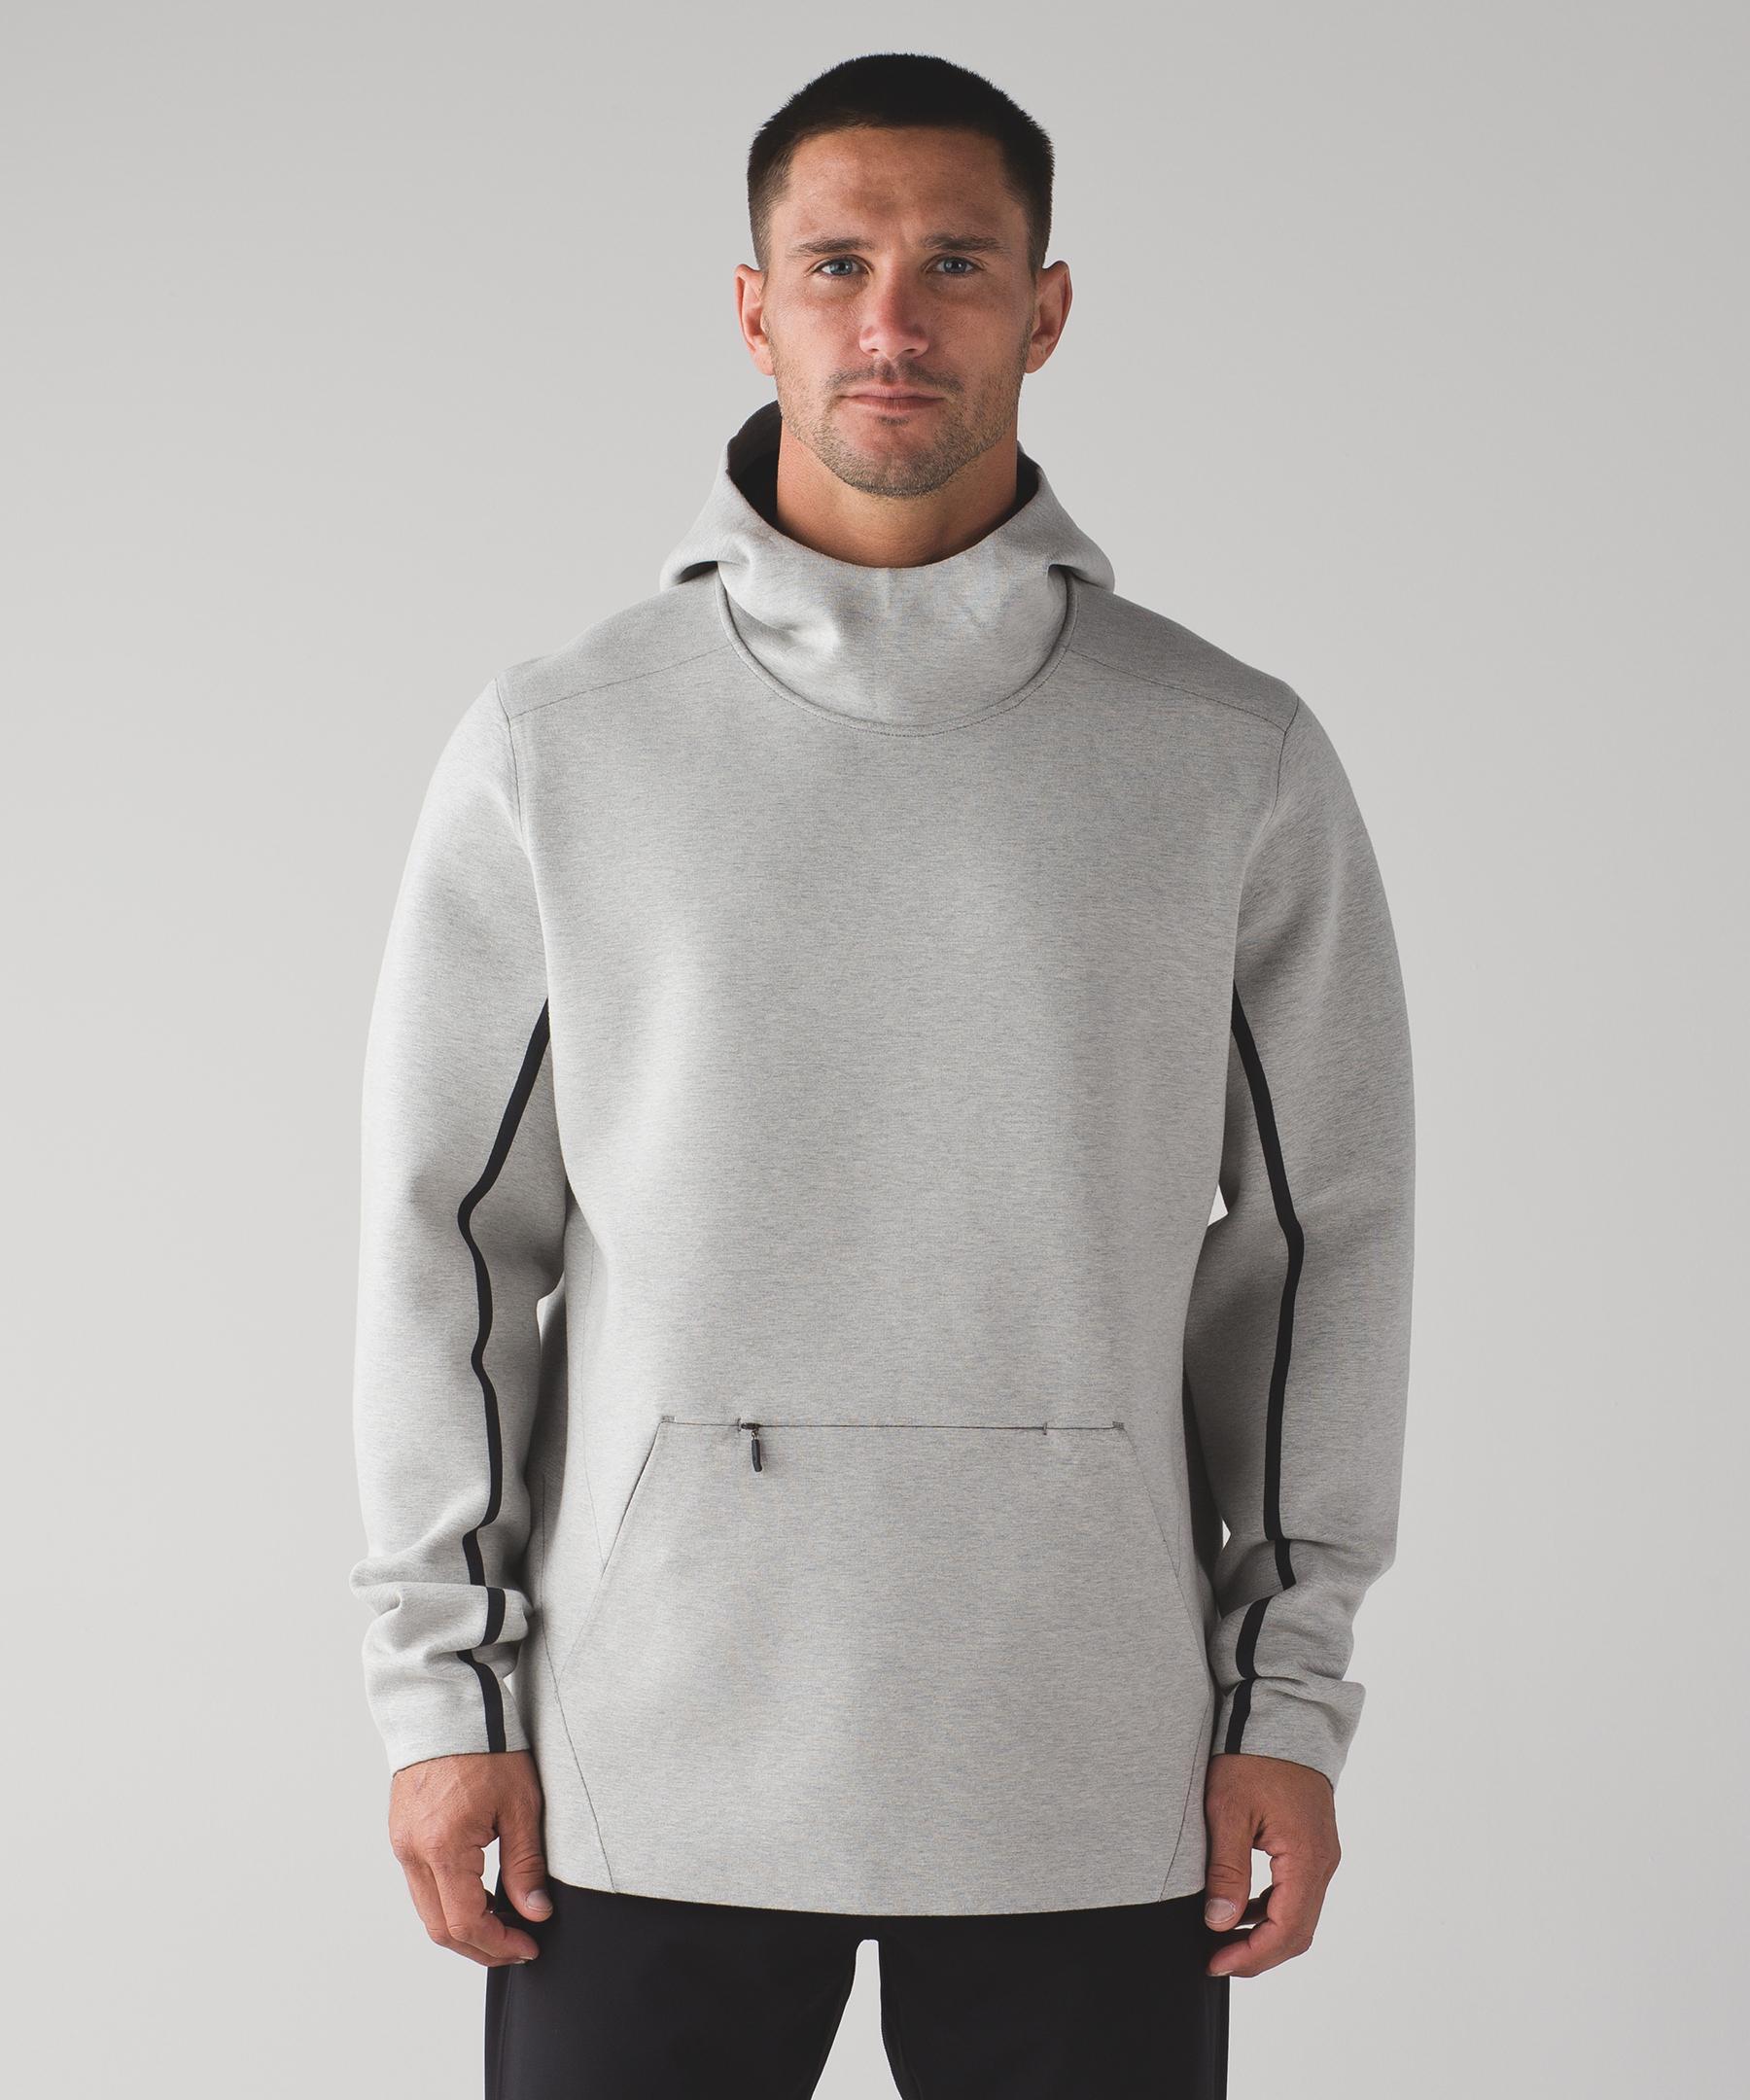 66768edcb0 lululemon athletica Stratum Pullover Hoodie in Gray for Men - Lyst